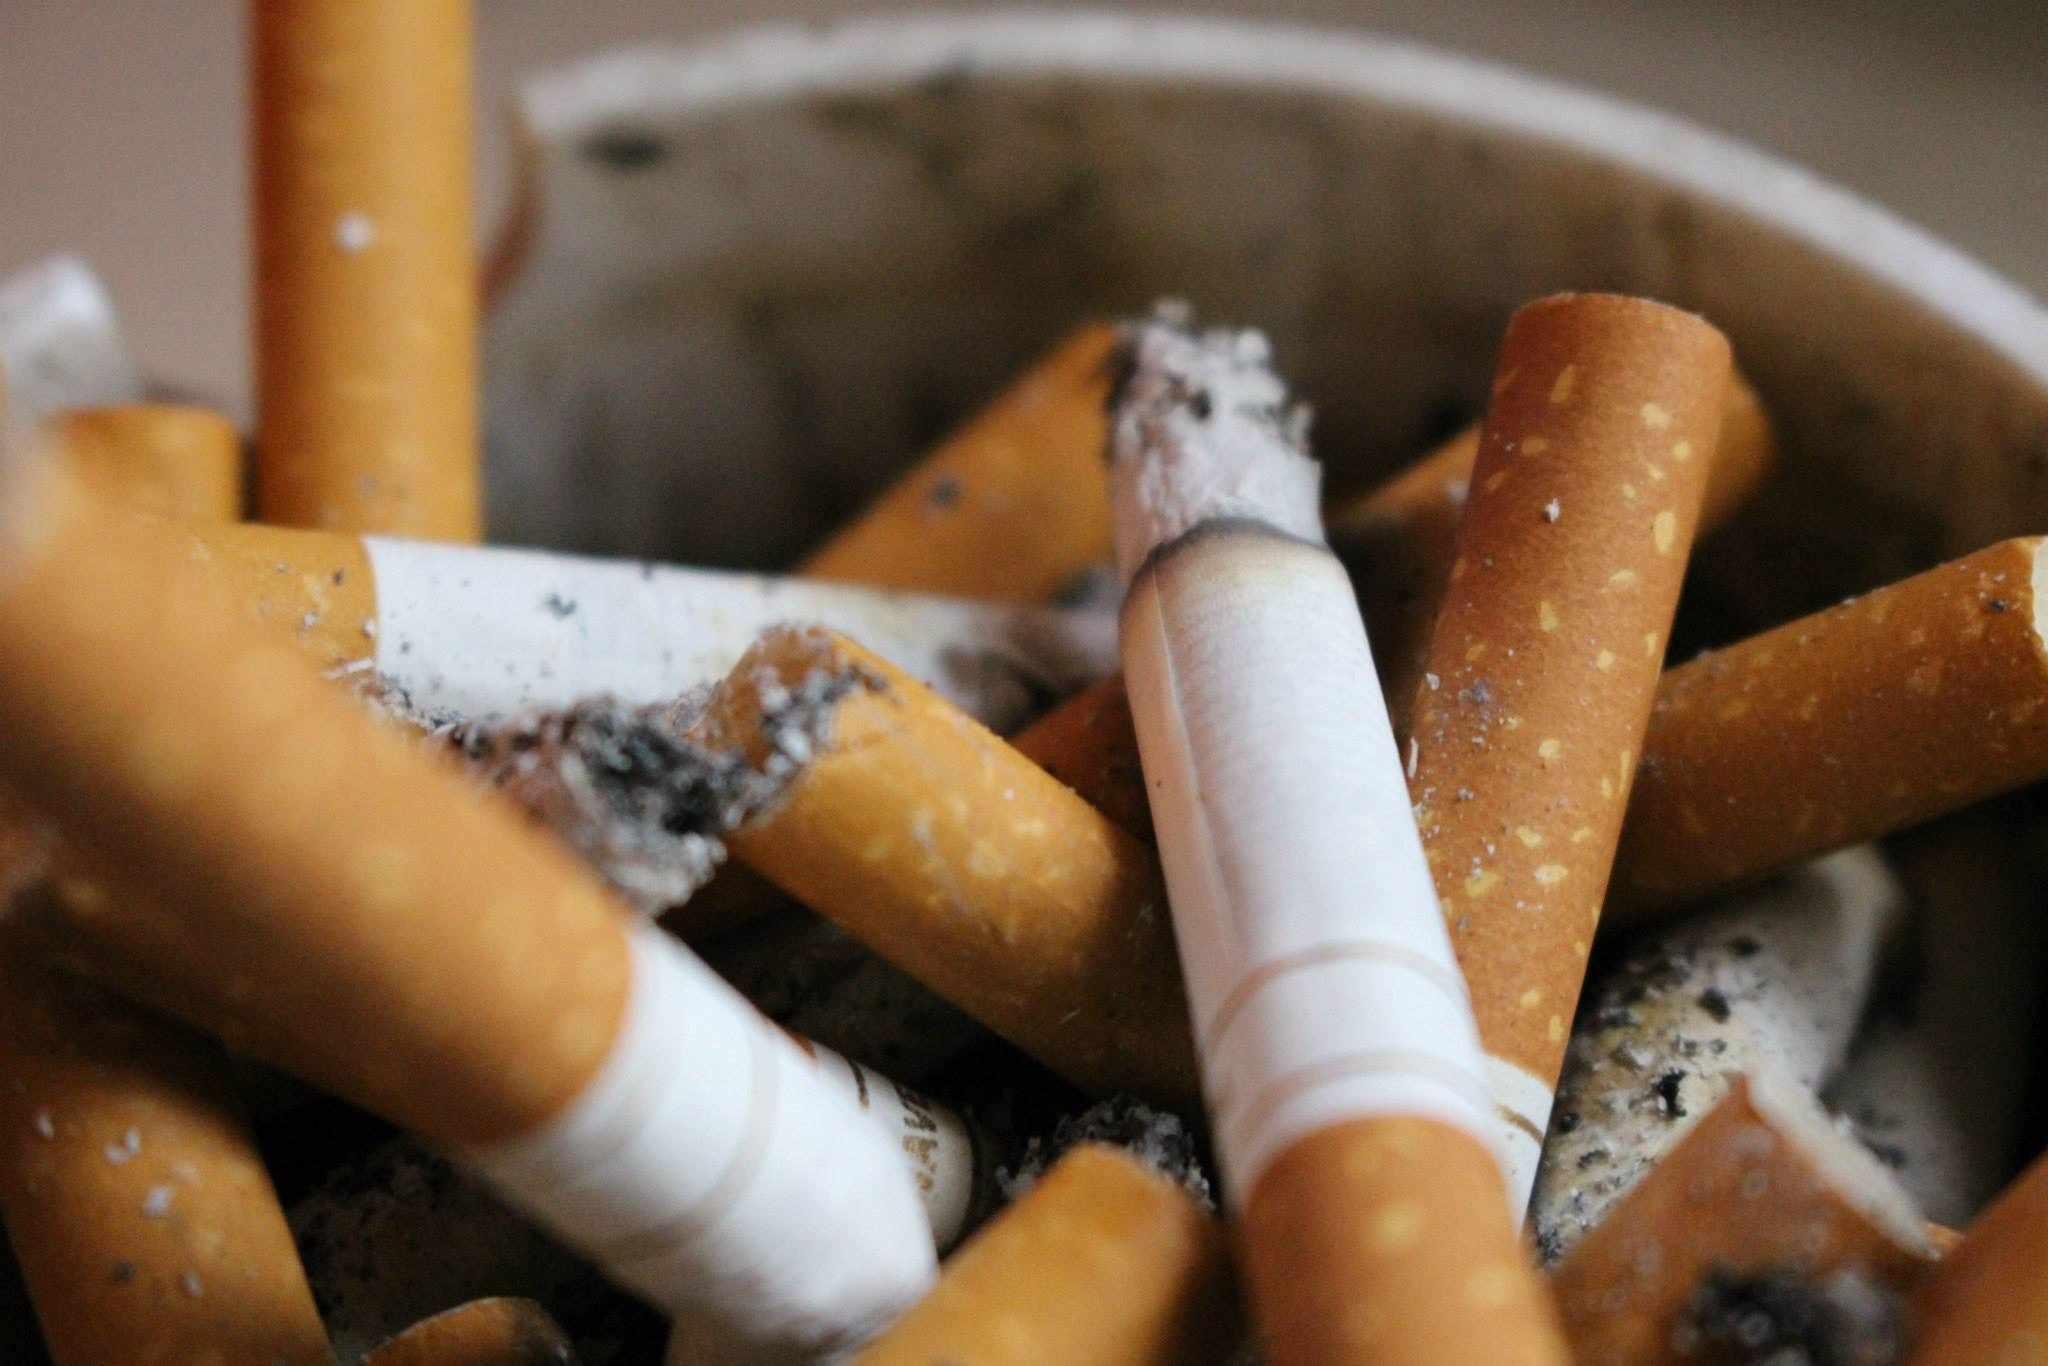 An ashtray full of cigarettes